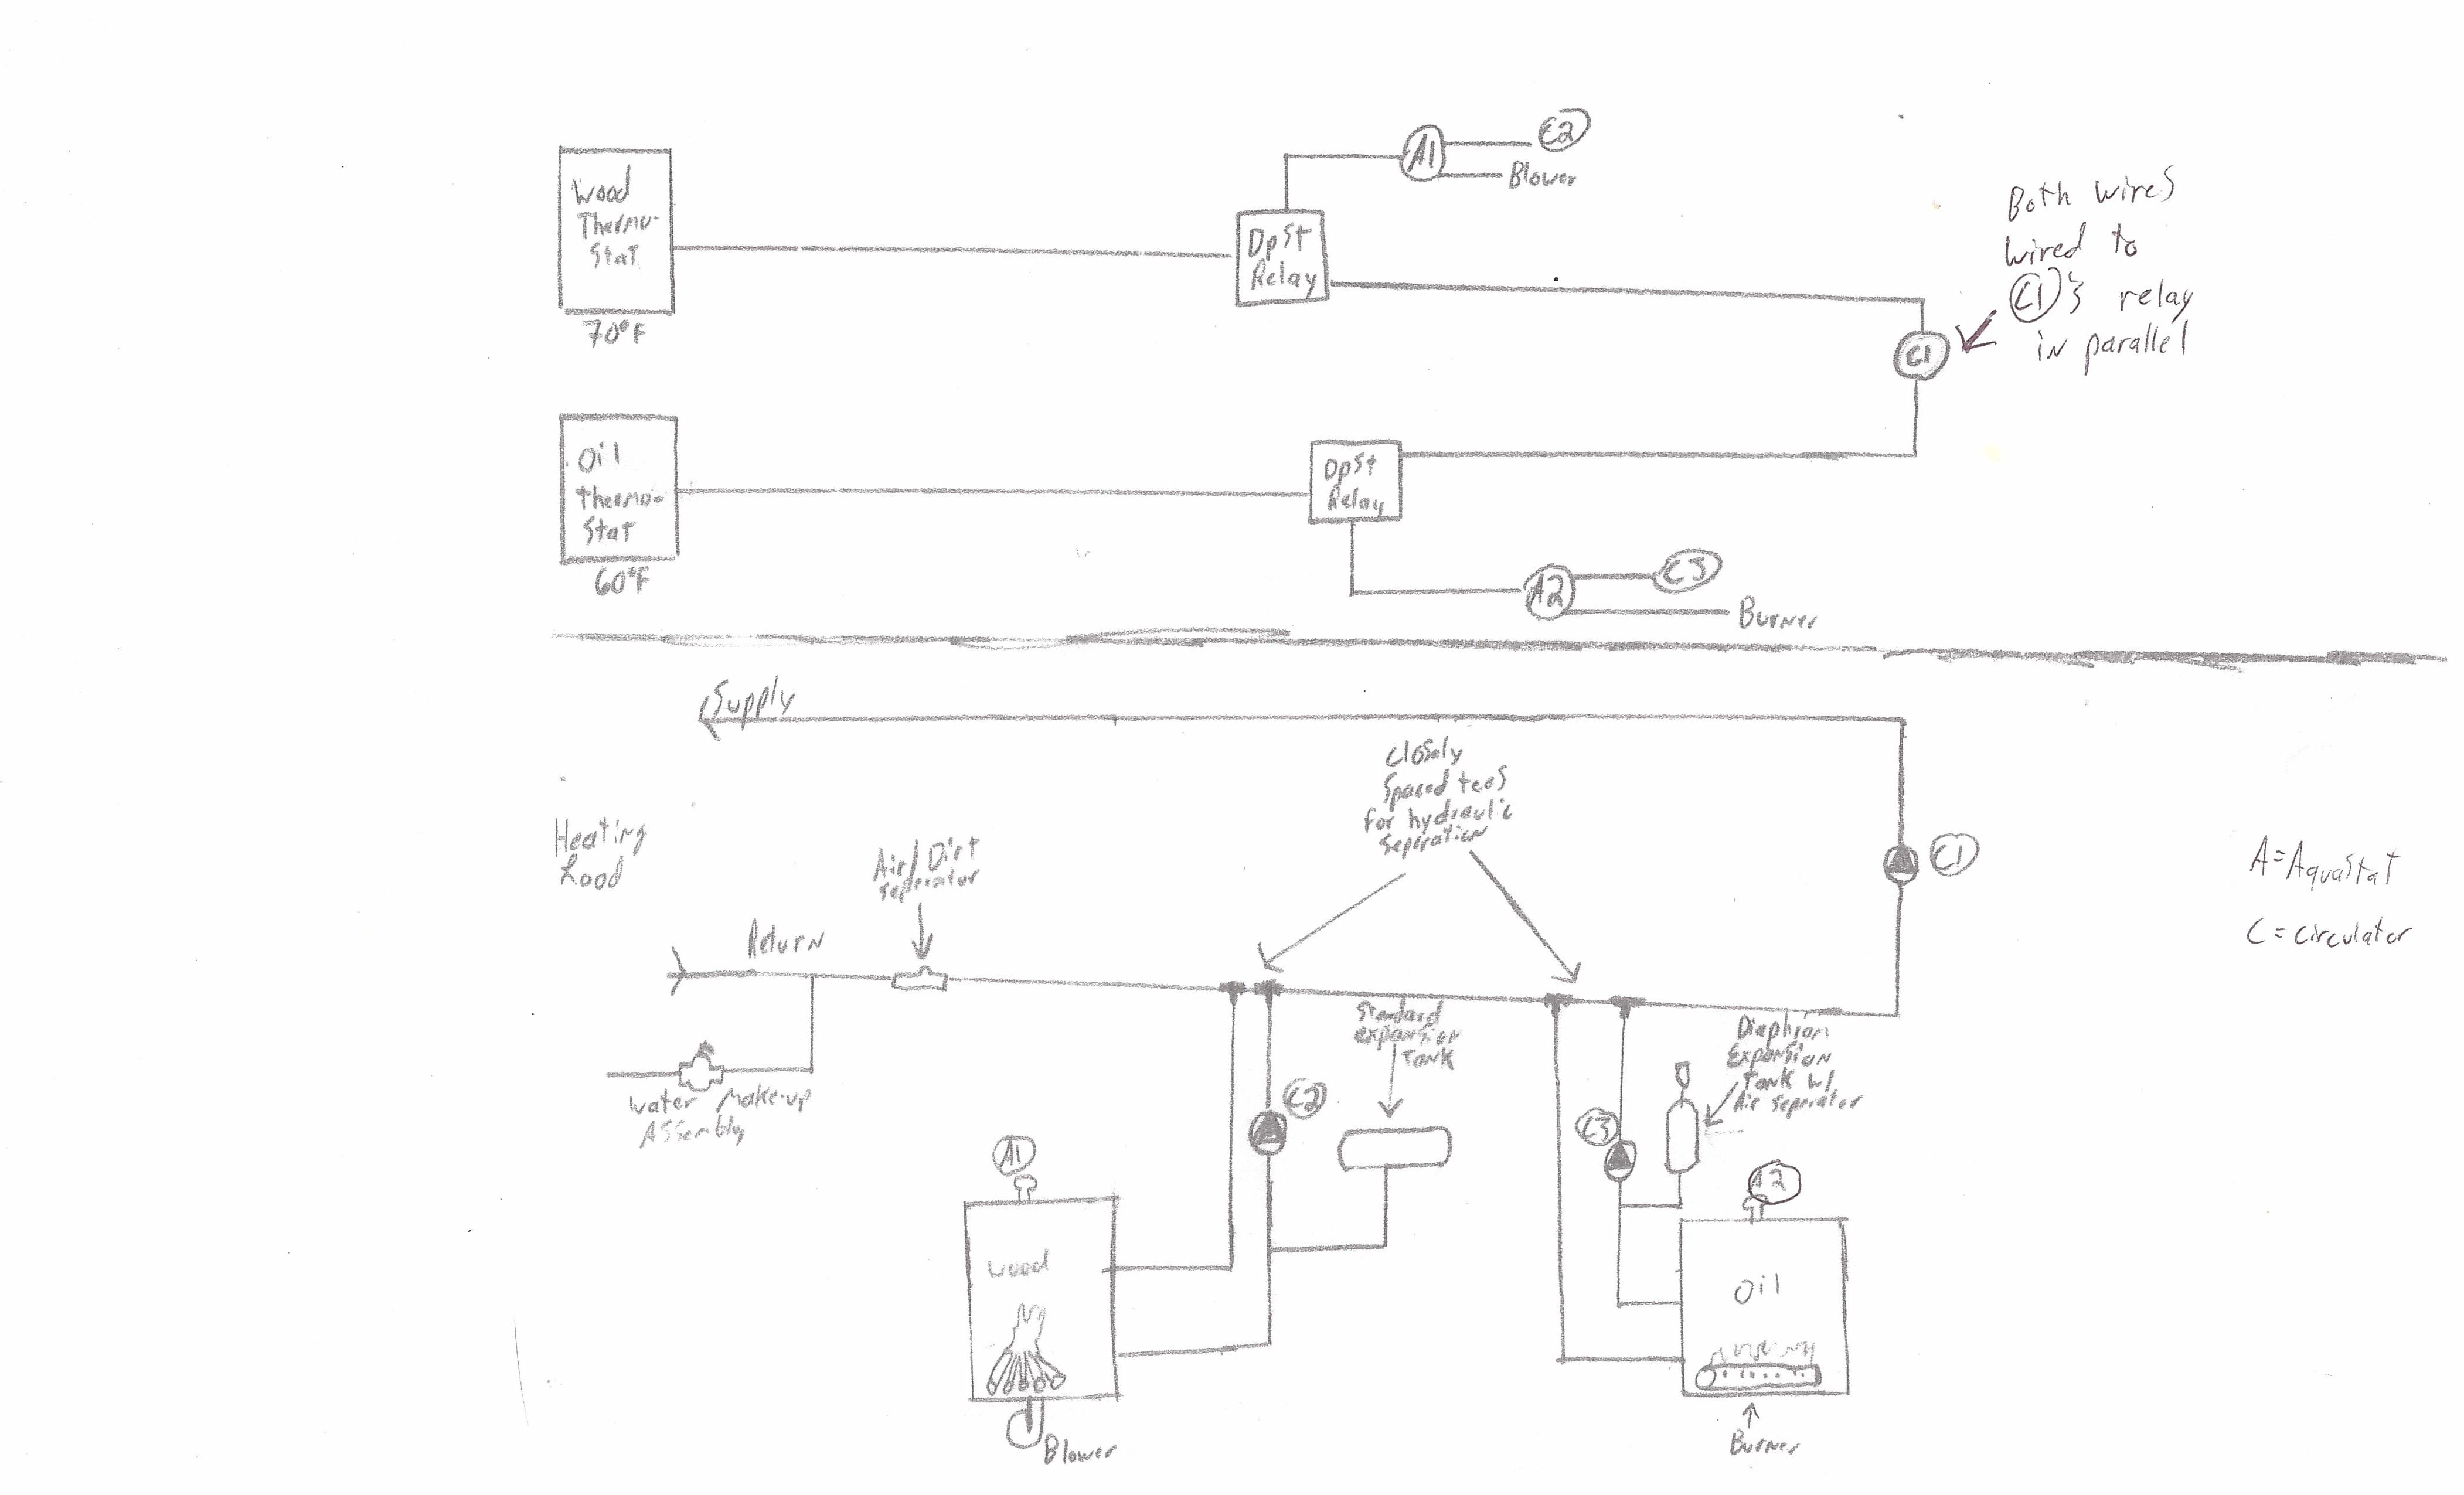 wiring diagram for wood stove blower need help hooking up indoor wood boiler     heating help the wall  need help hooking up indoor wood boiler